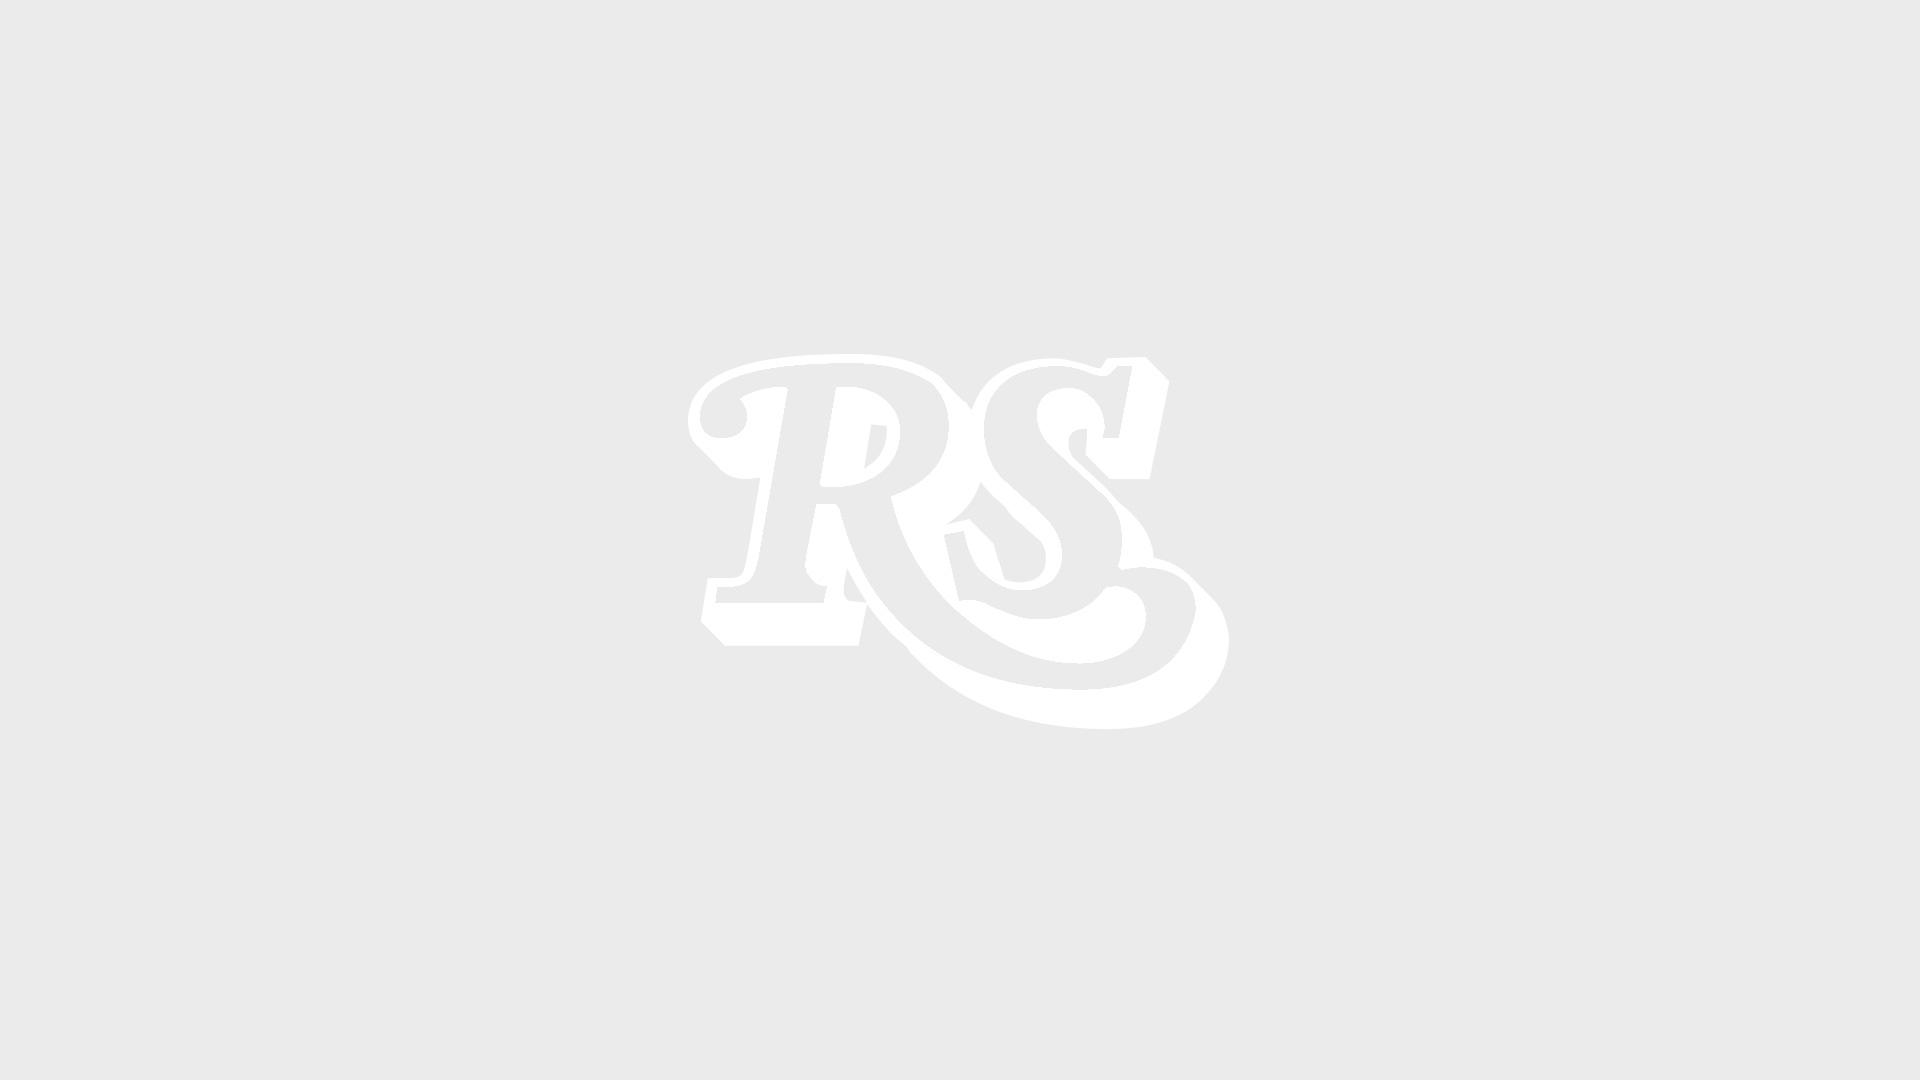 WEST HOLLYWOOD, CA - NOVEMBER 05:  (L-R) Daniel Adair, Chad Kroeger, Mike Kroeger and Ryan Peake of Nickelback pose at the sp